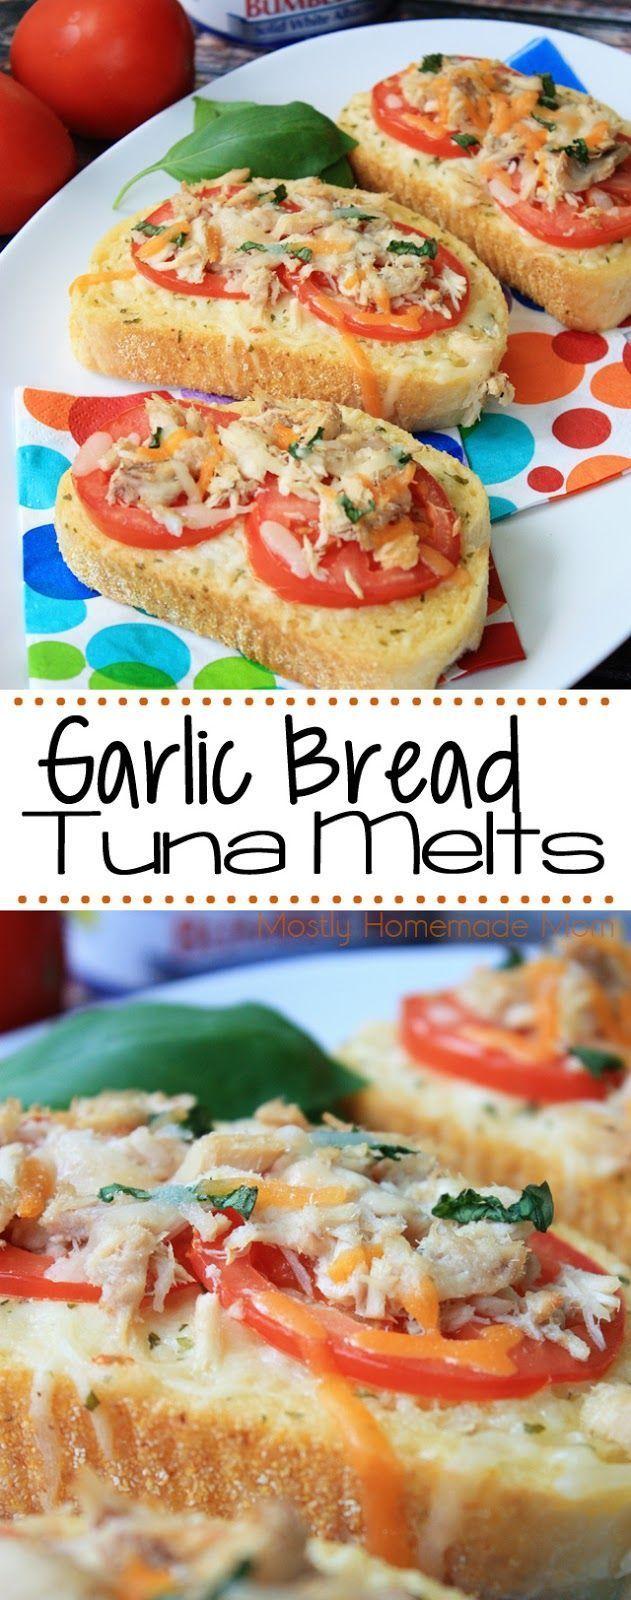 Garlic Bread Tuna Melts | Recipe | Tuna melts, Food, Food ...